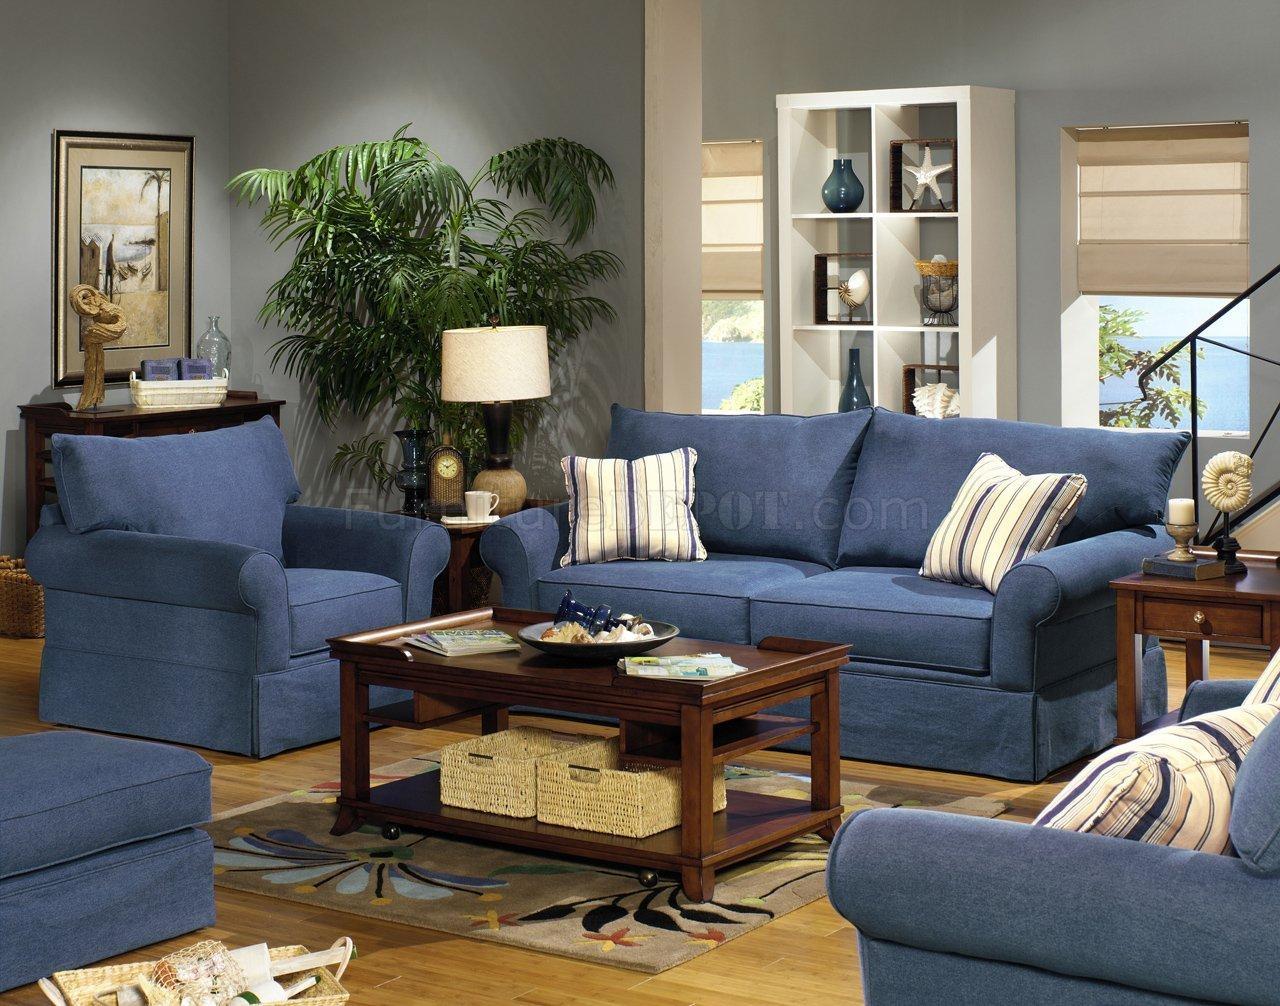 Blue Denim Fabric Modern Sofa & Loveseat Set W/options With Denim Loveseats (Image 5 of 20)